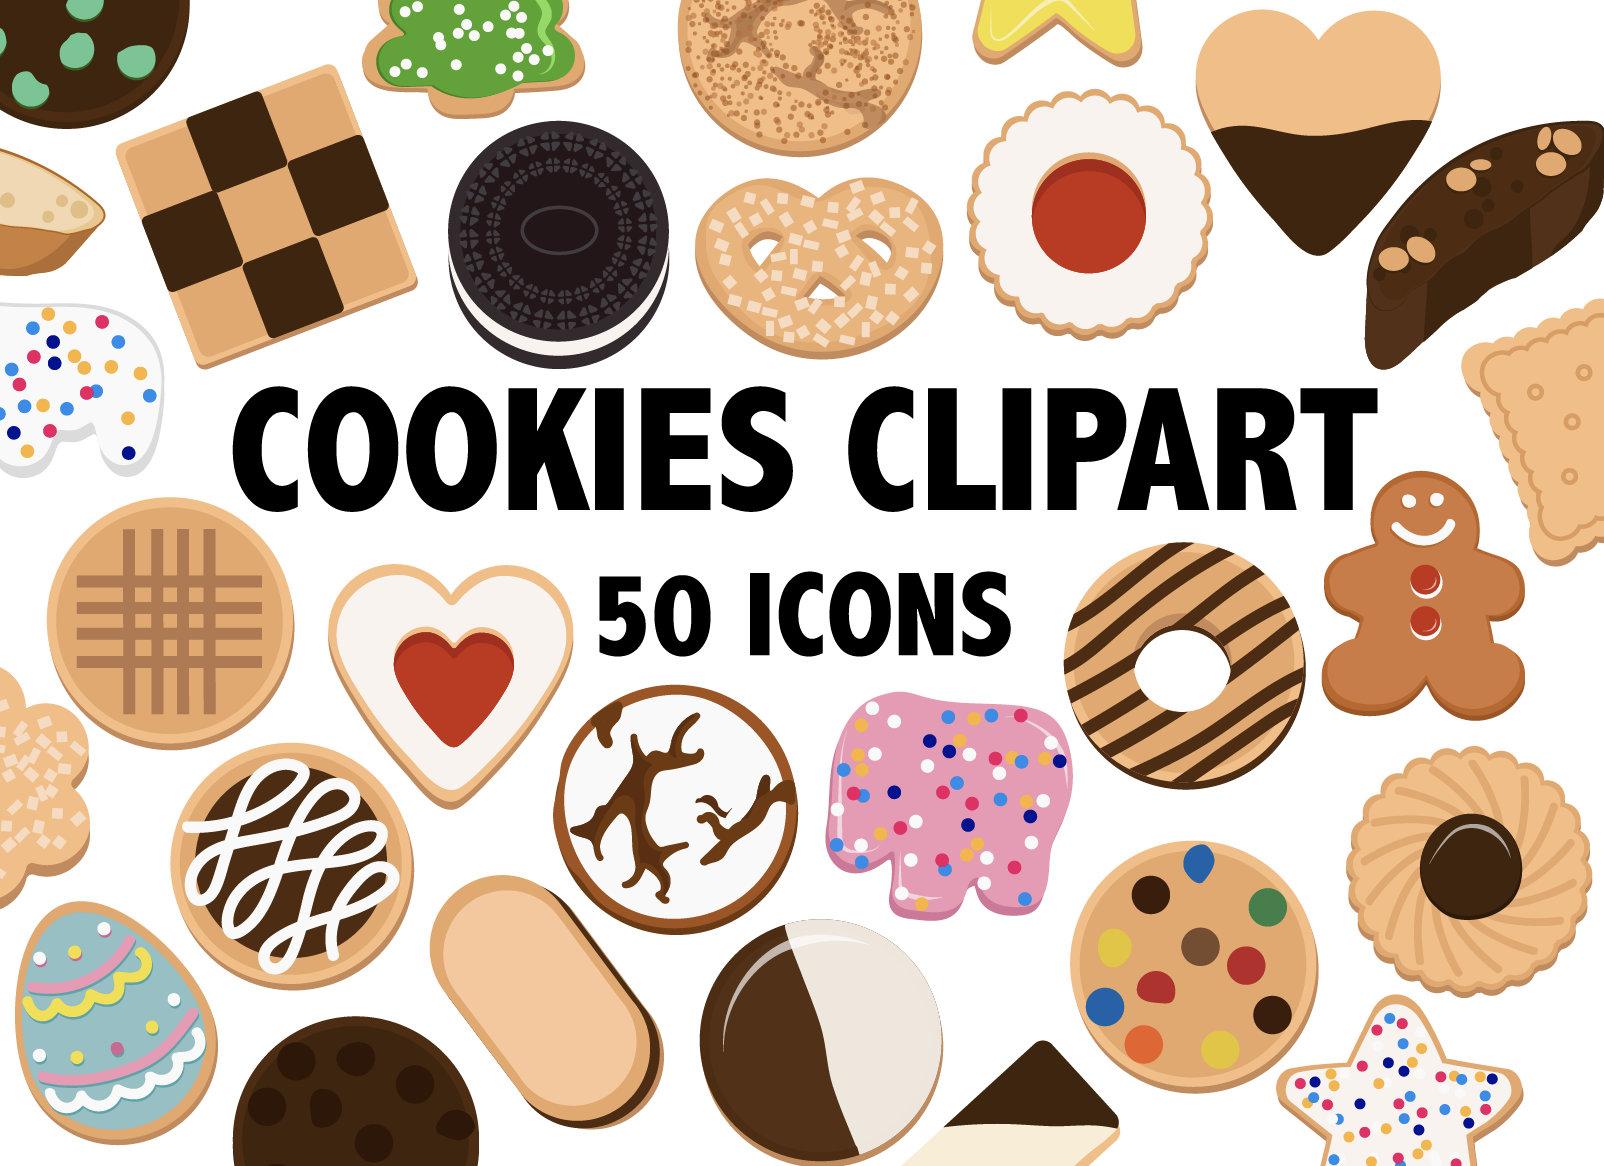 Bakery clipart baking. Cookies cookie food